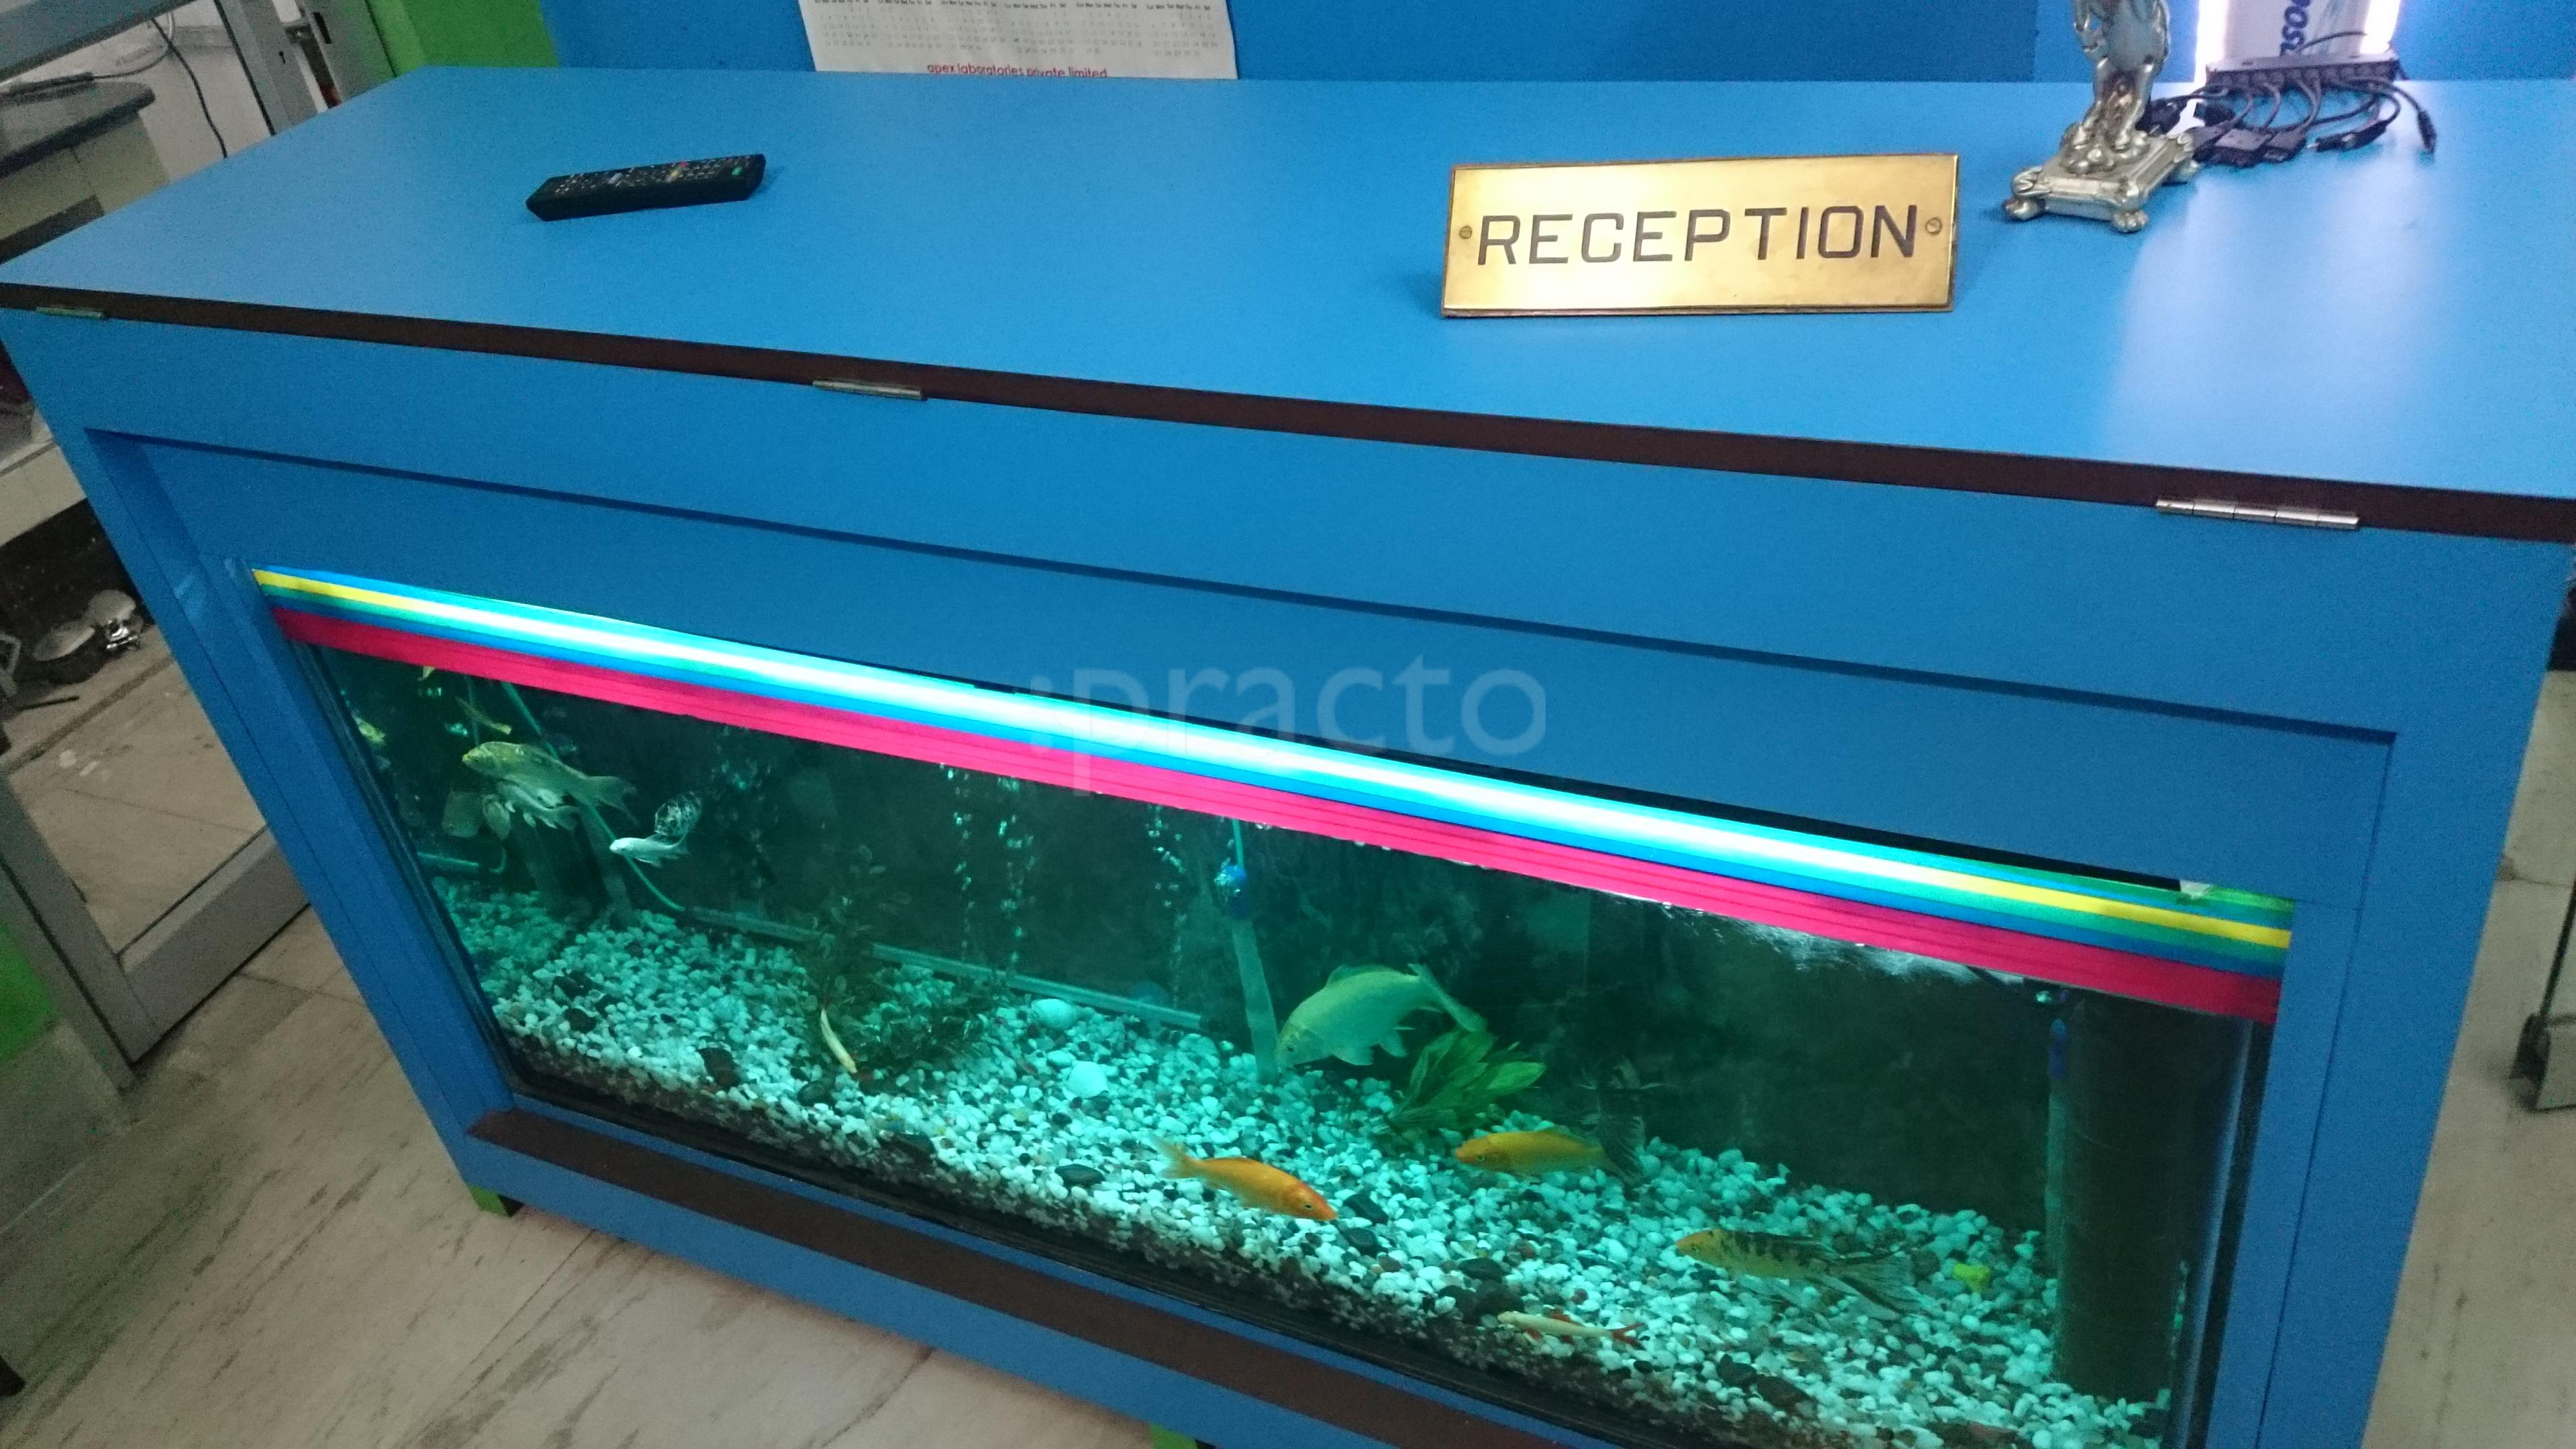 Fish aquarium in surat timings - Fish Aquarium In Surat Timings